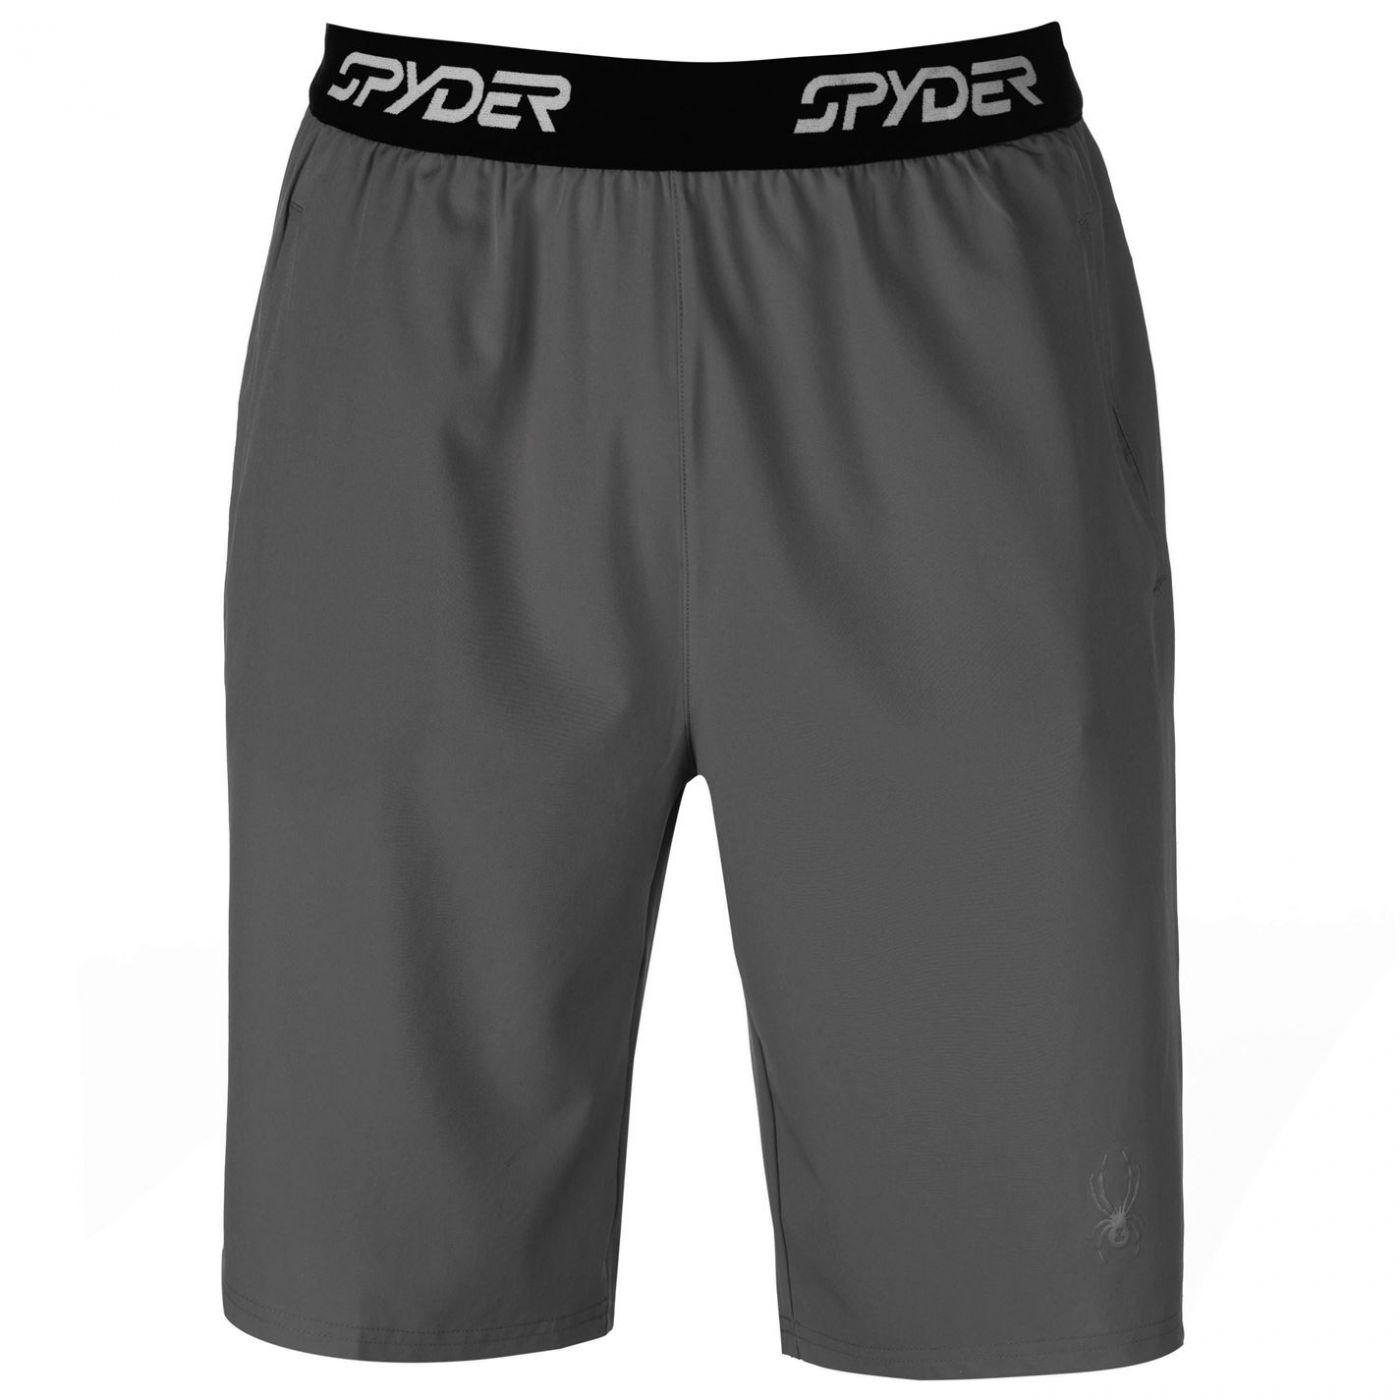 Men's shorts Spyder Alpine Sn74